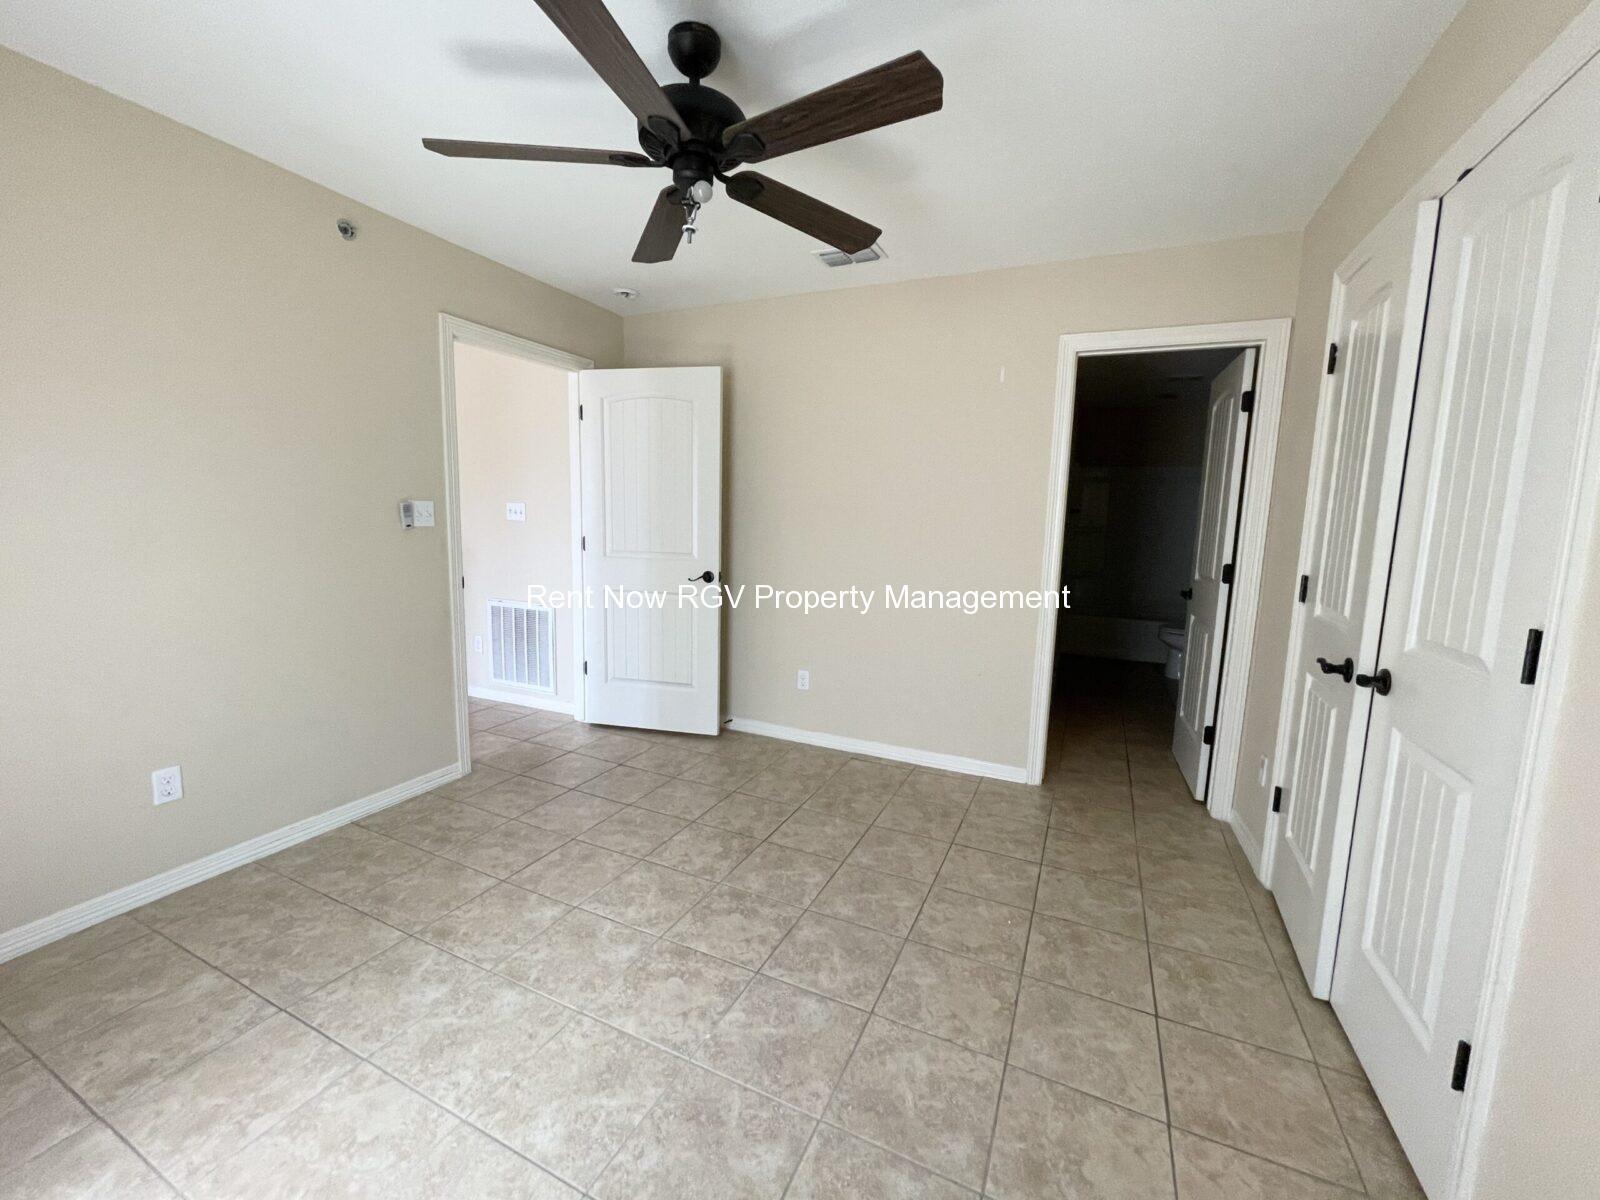 201 N LINARES ST ALTON, TX 78573